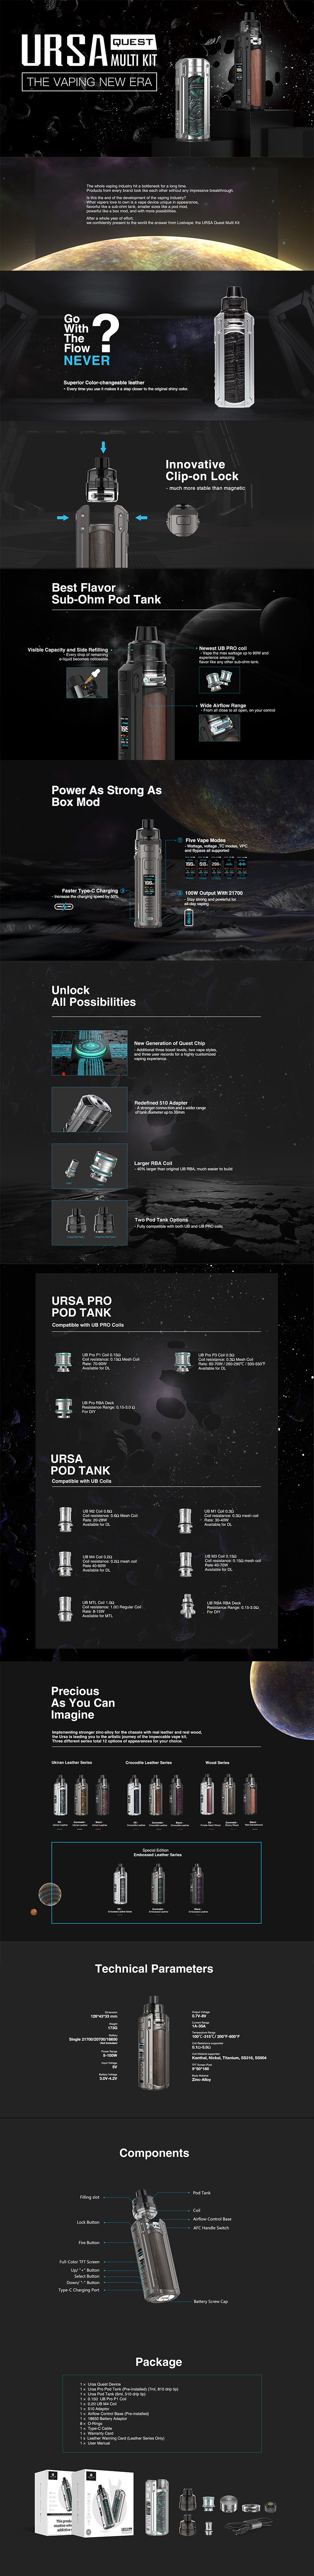 Authentic Lost Vape Ursa Quest Multi Pod Mod Kit 100W TC VW Box Mod + Ursa Pro Pod